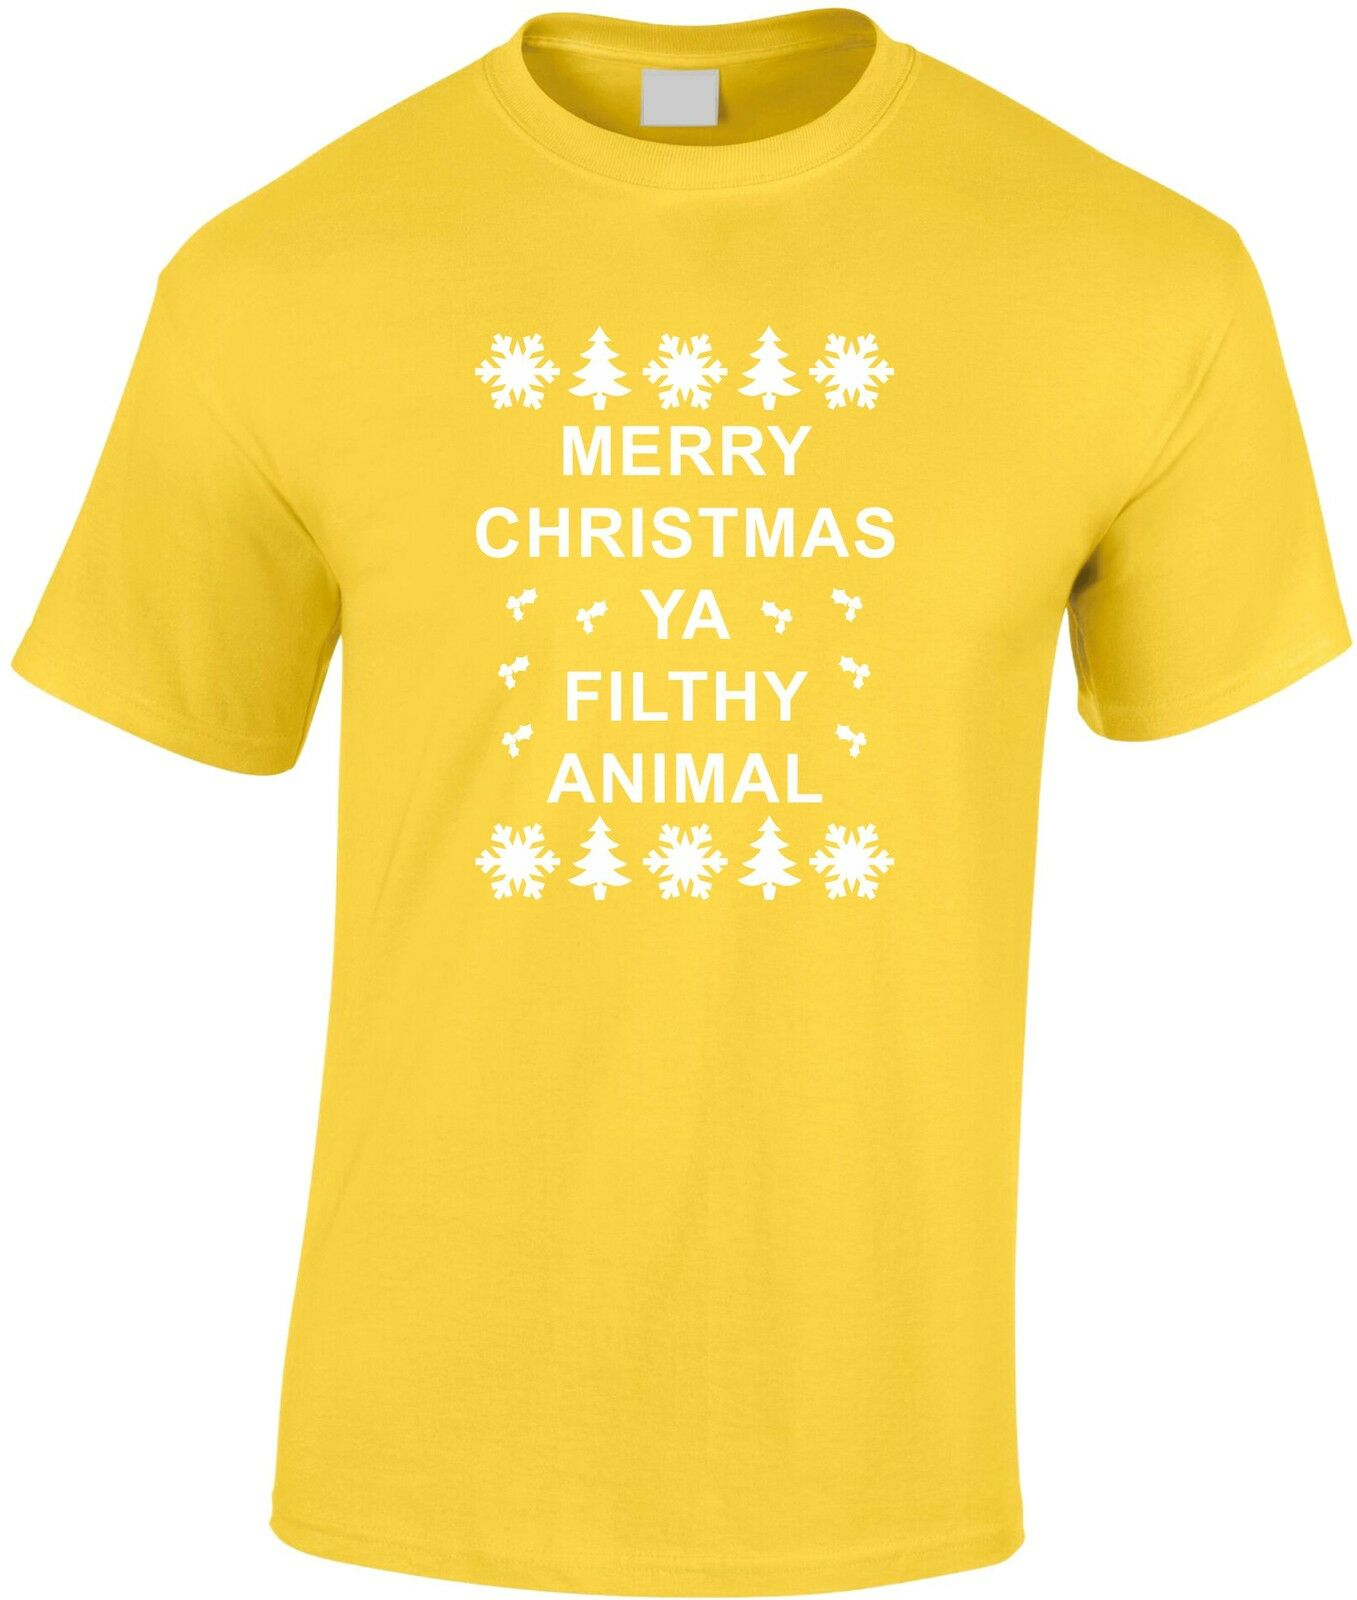 Kids Childrens Christmas T-shirt Snowman Merry Christmas Kids T-shirt KTS202